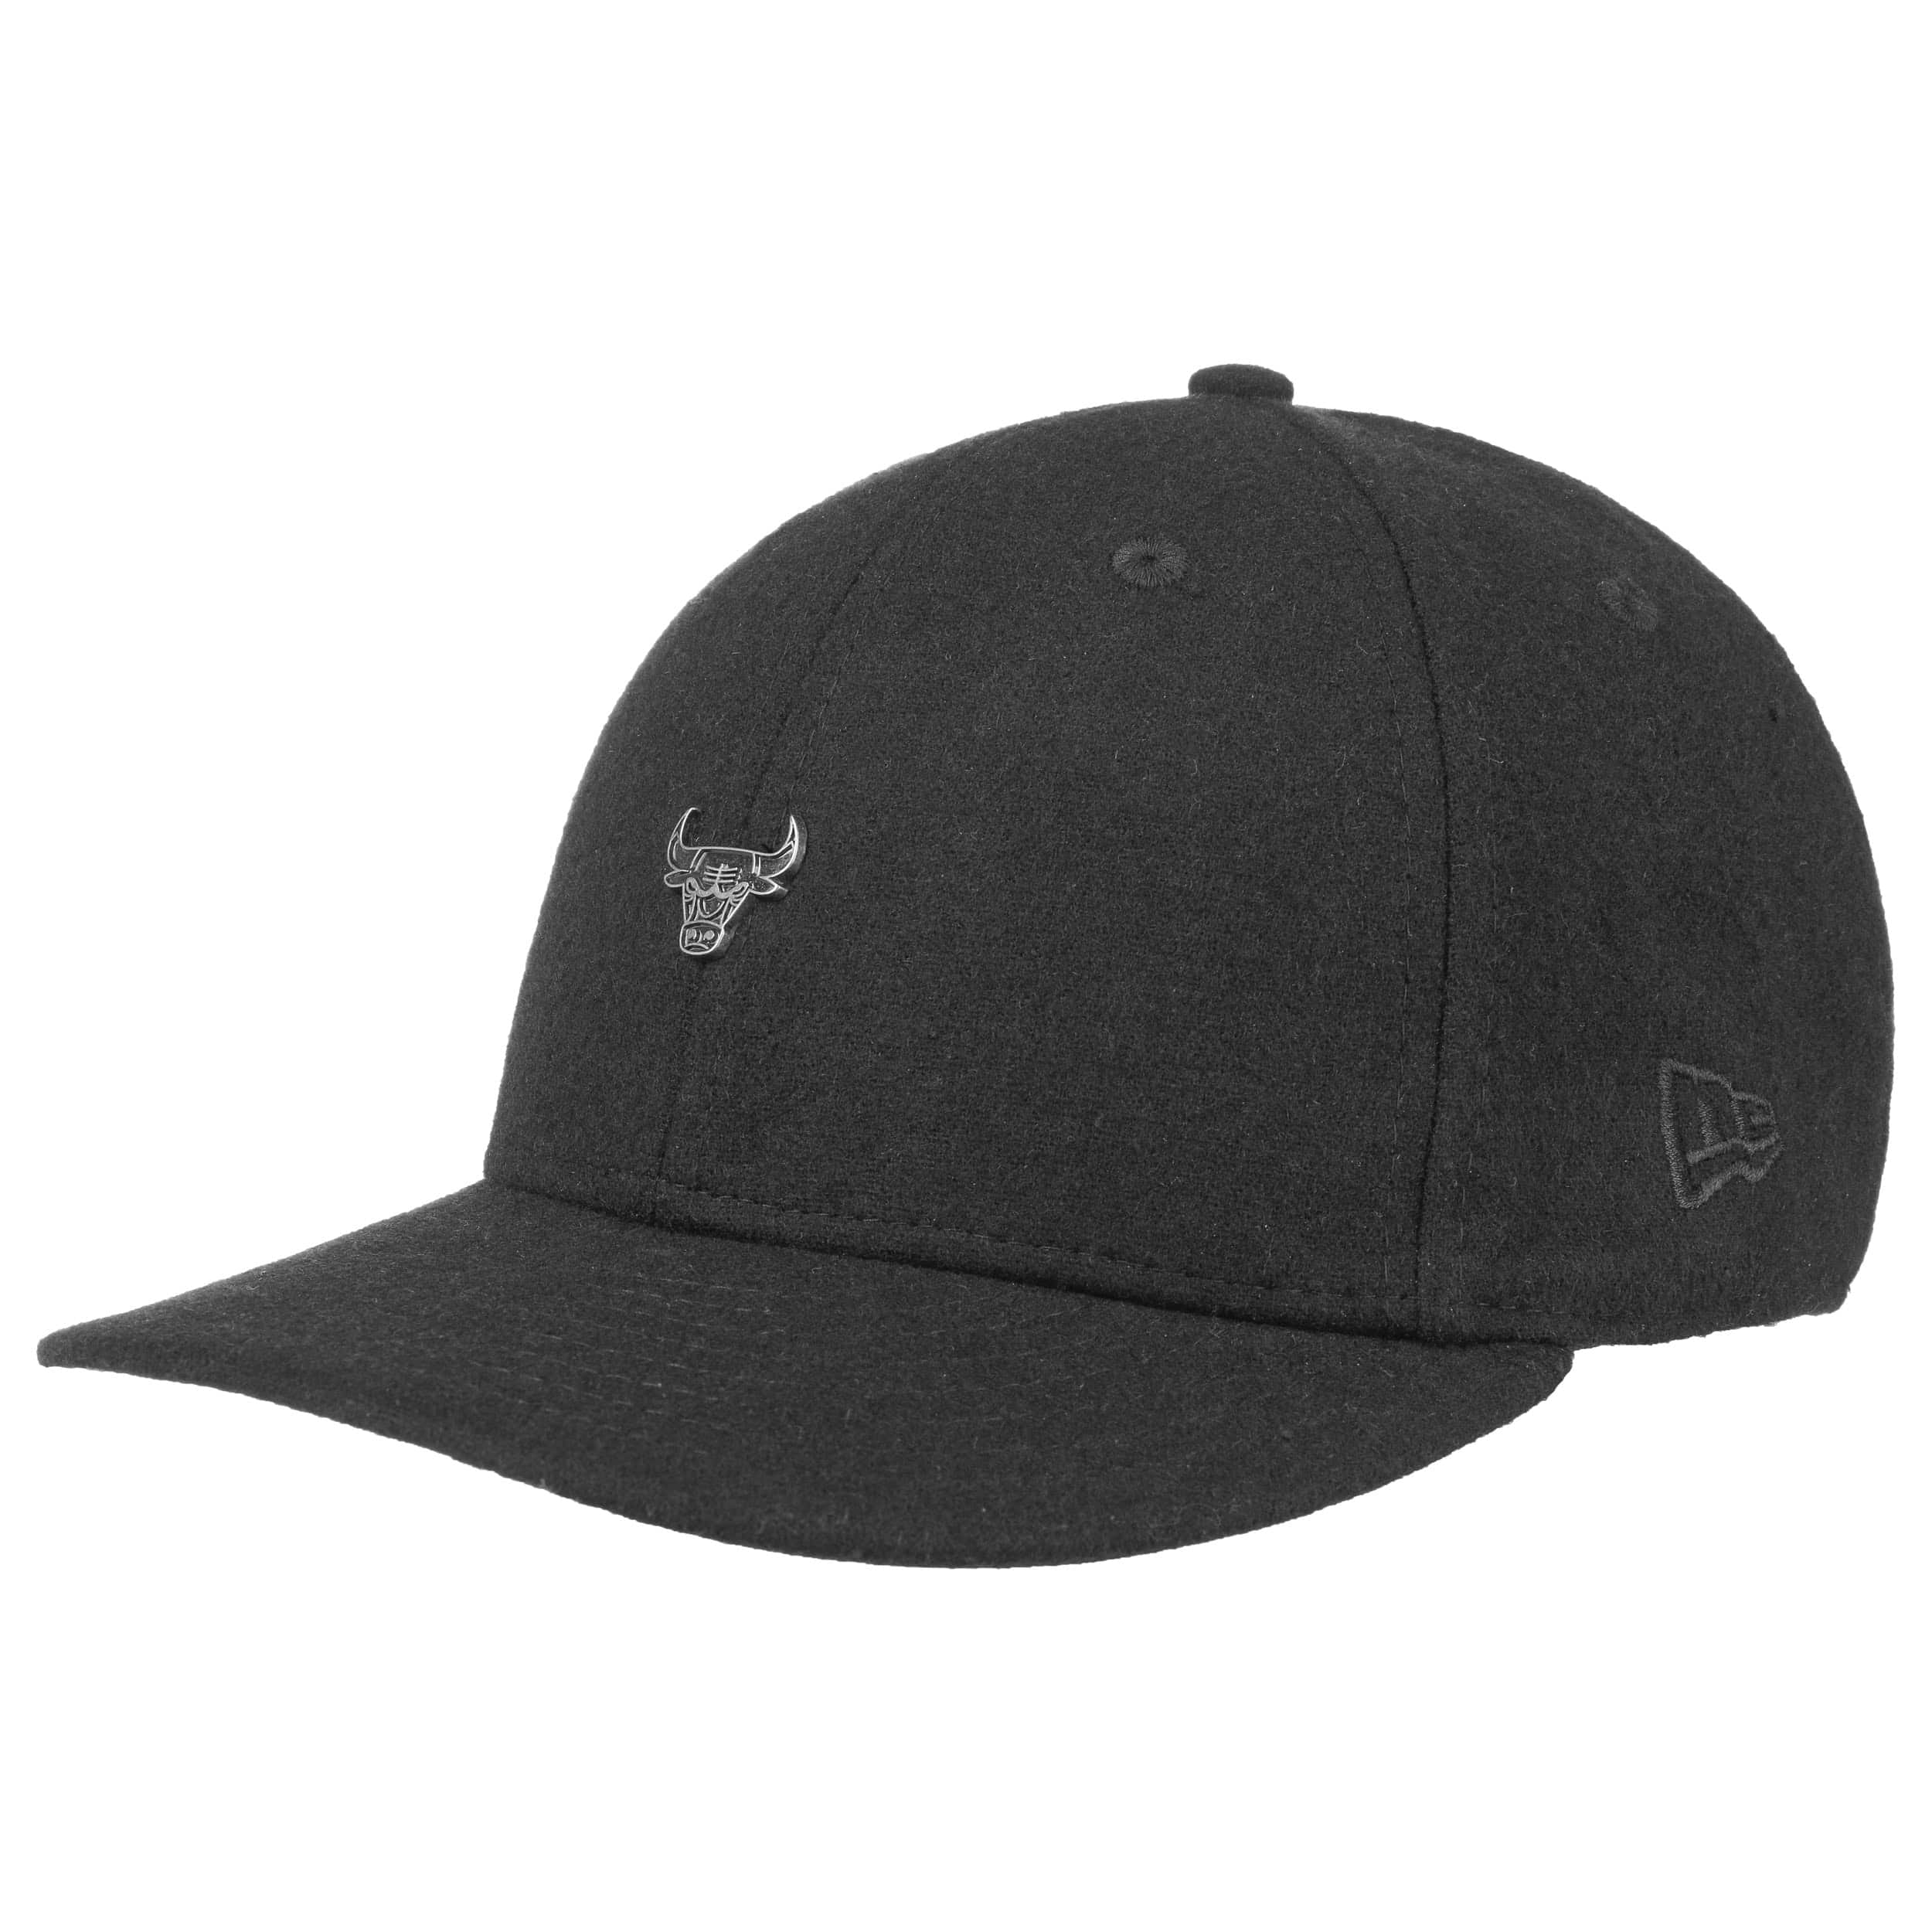 1f0491e1 ... 59Fifty Low Profile Pin Bulls Cap by New Era - black 6